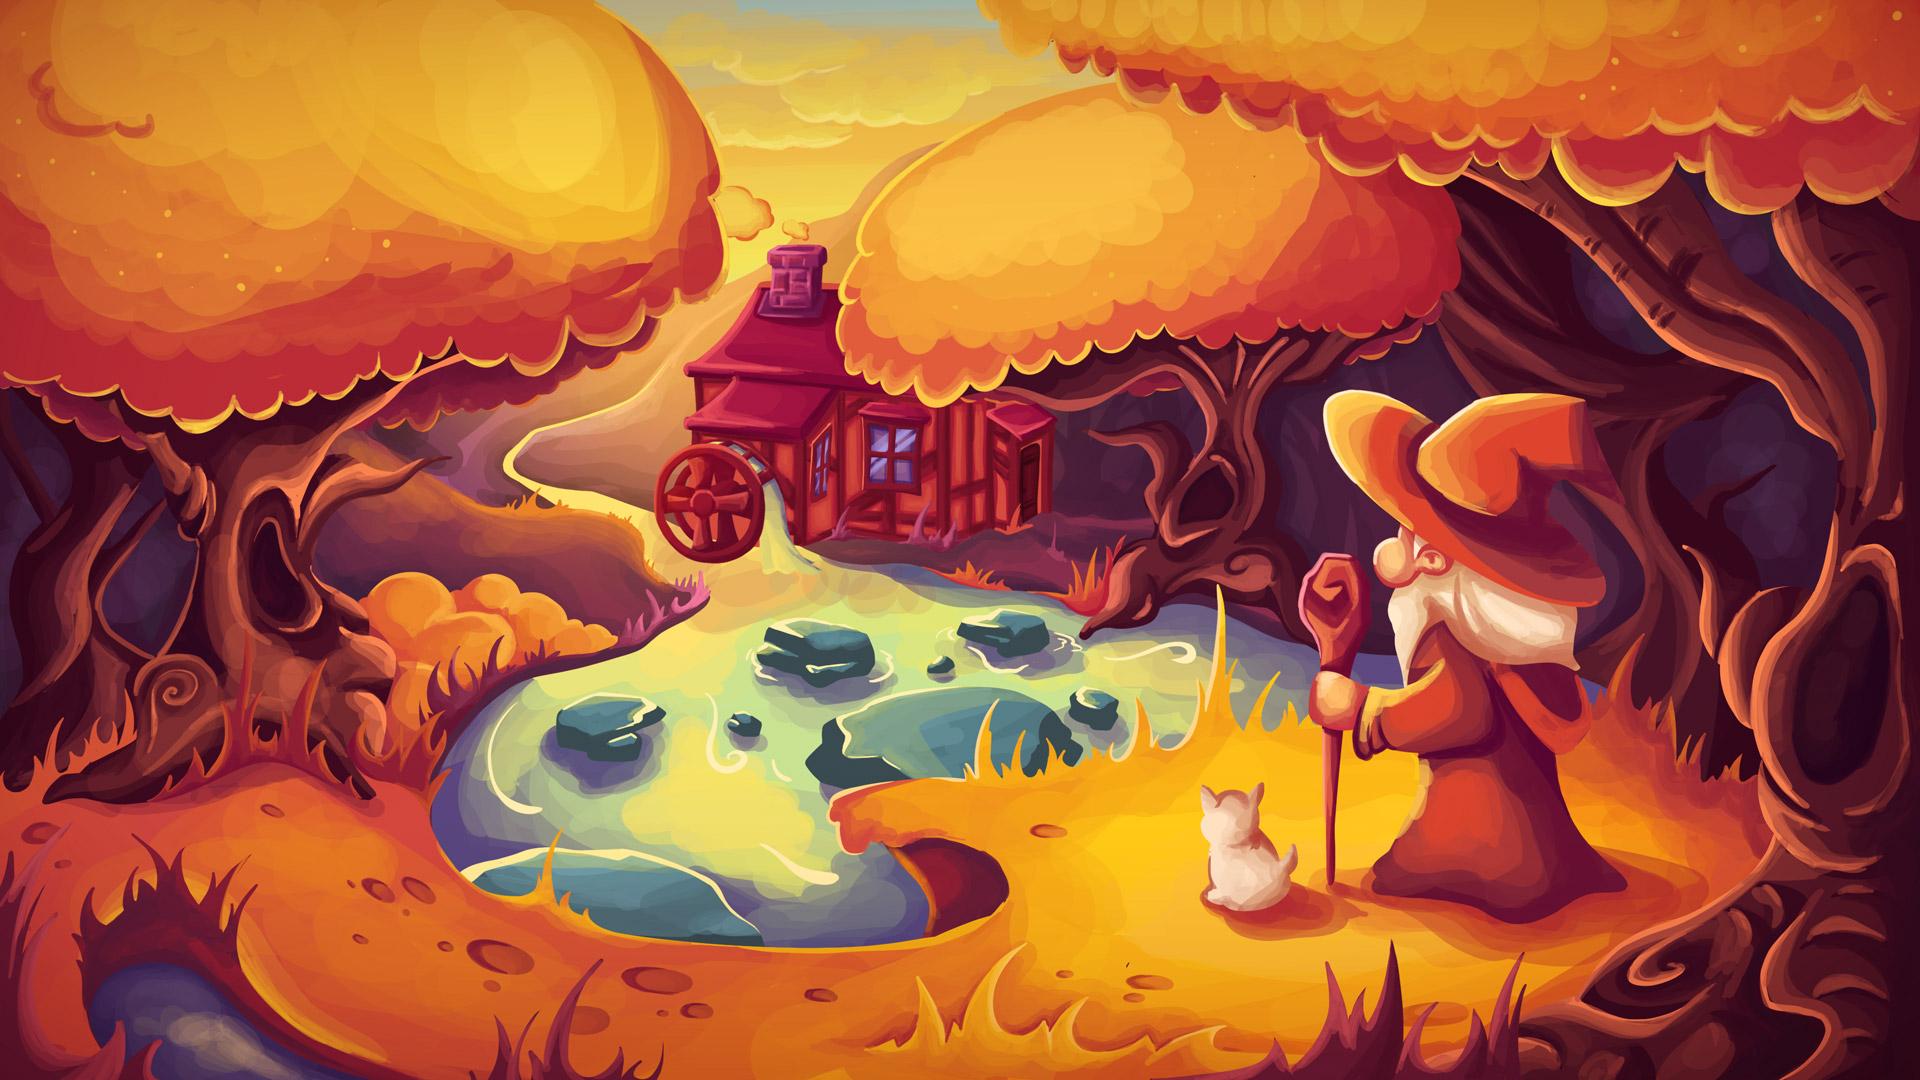 Illustration Wanderer